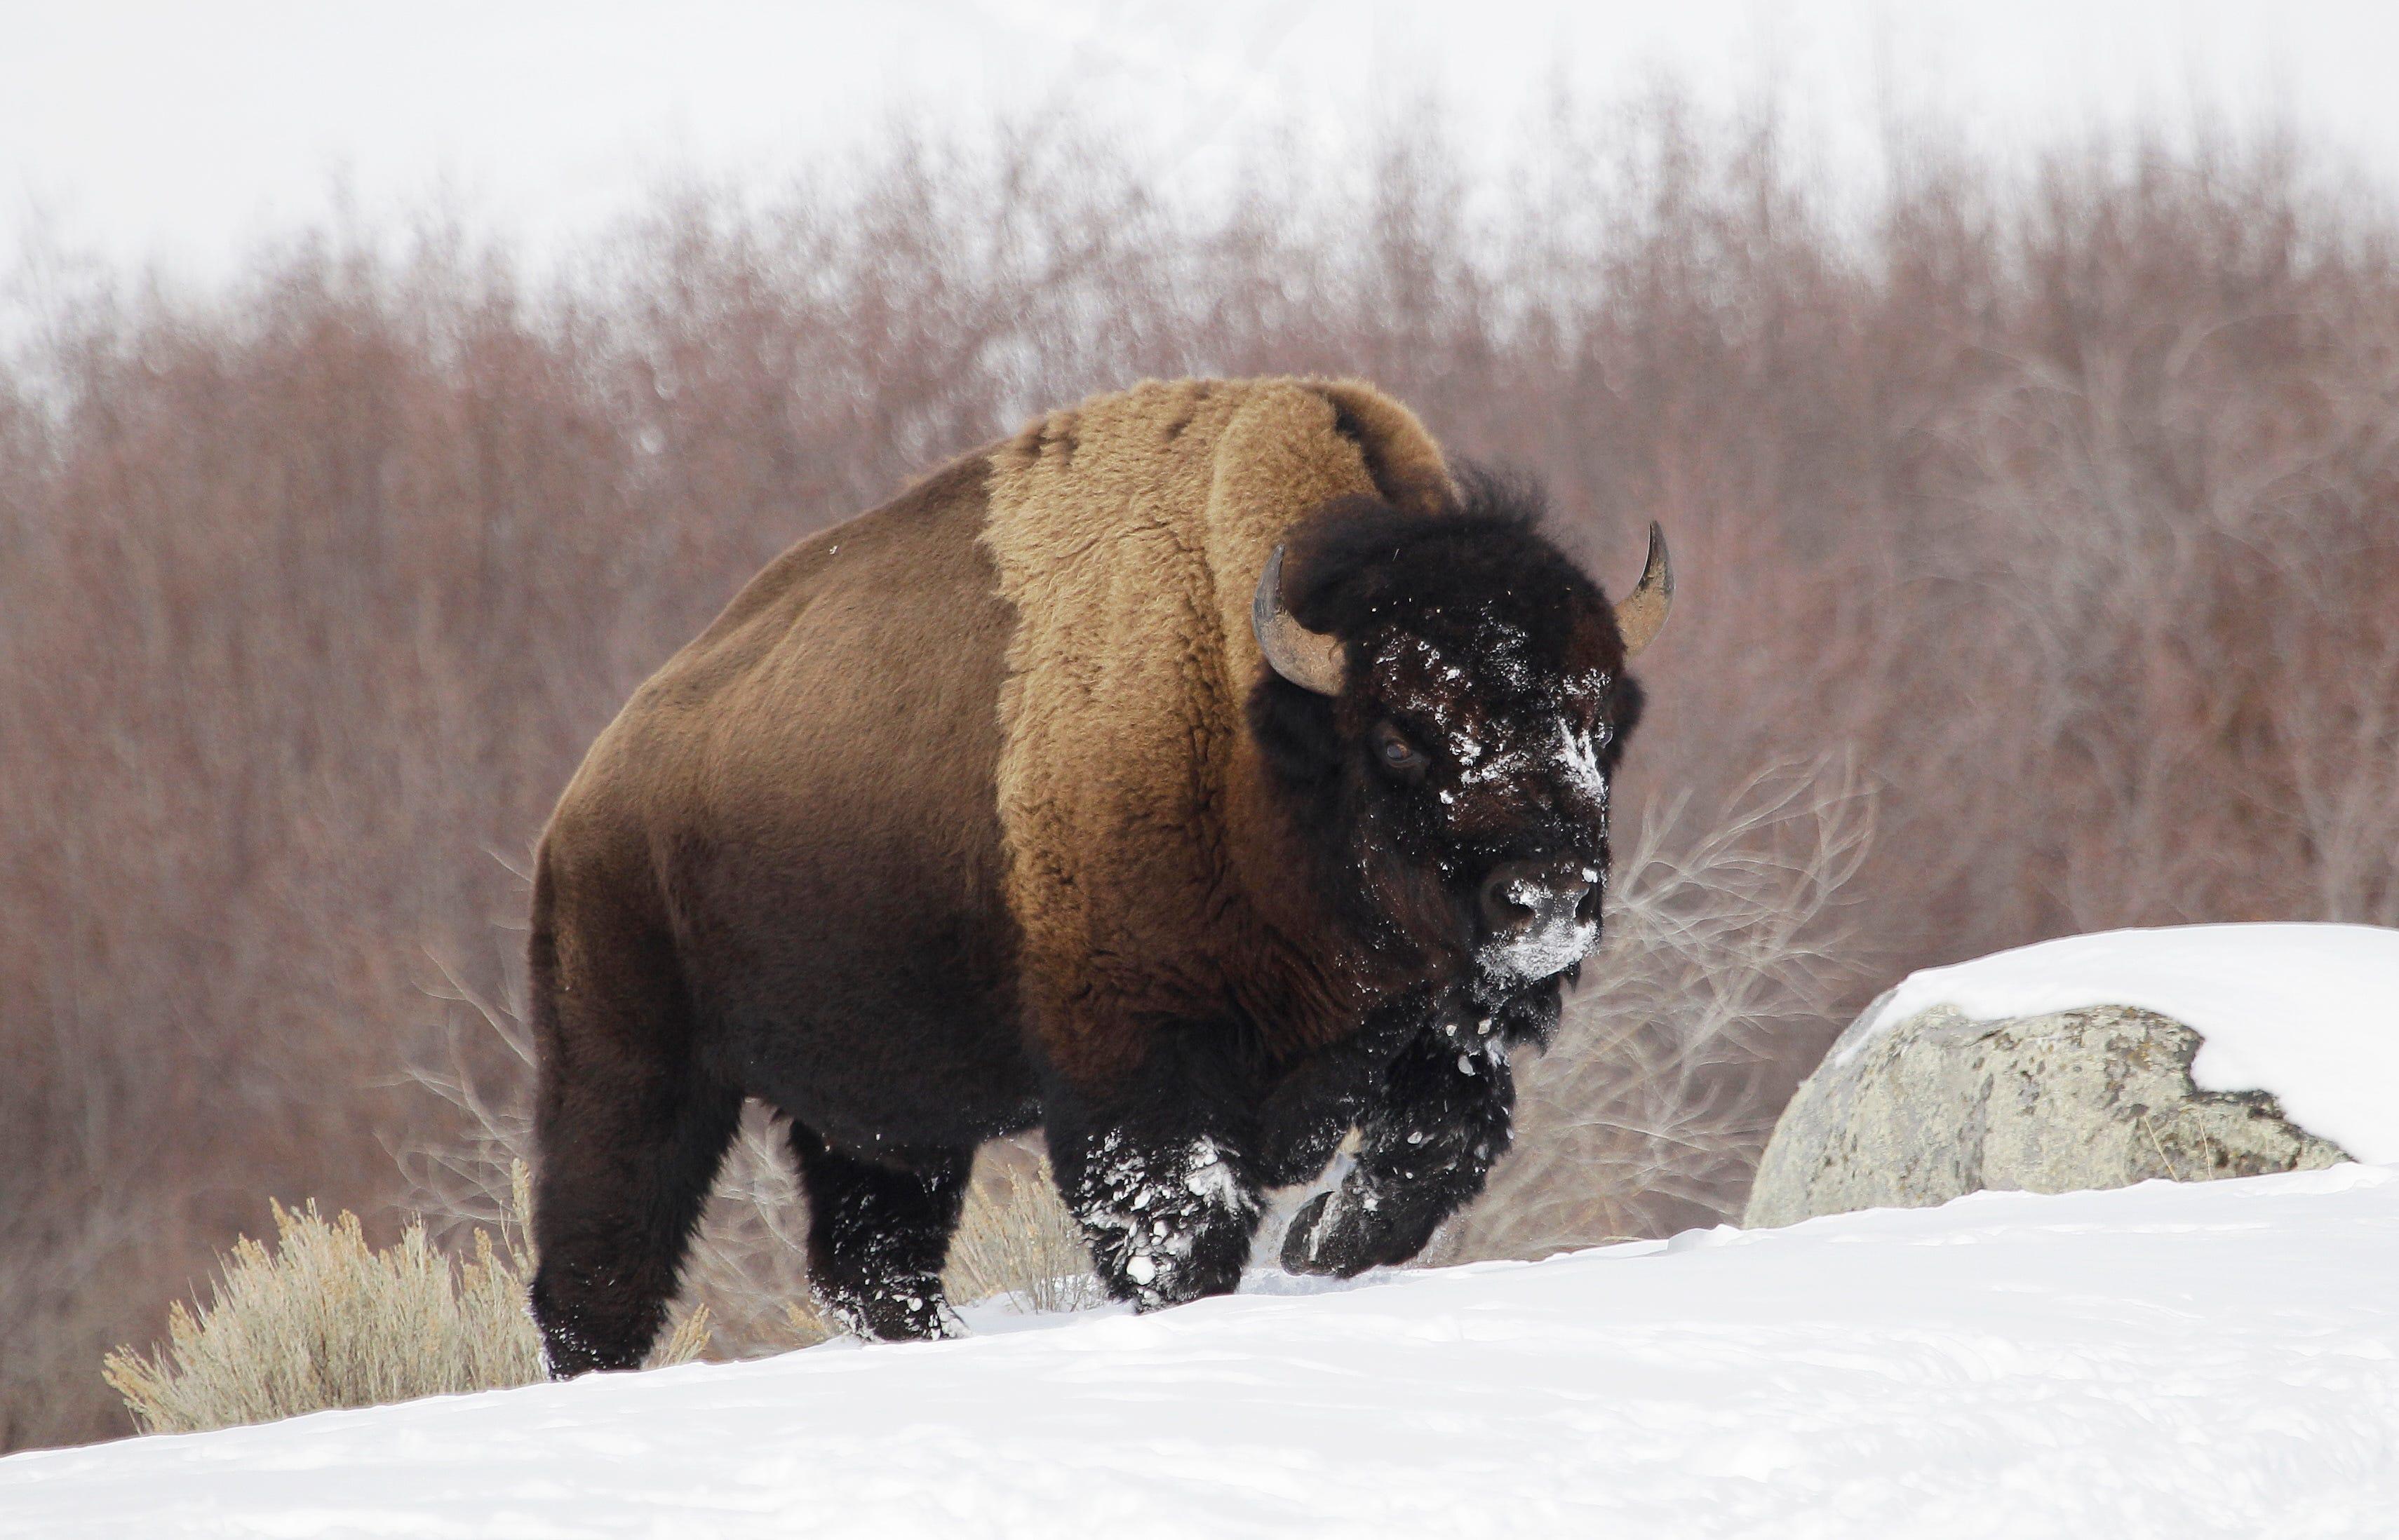 Yellowstone National Park, Grand Teton National Park have record October